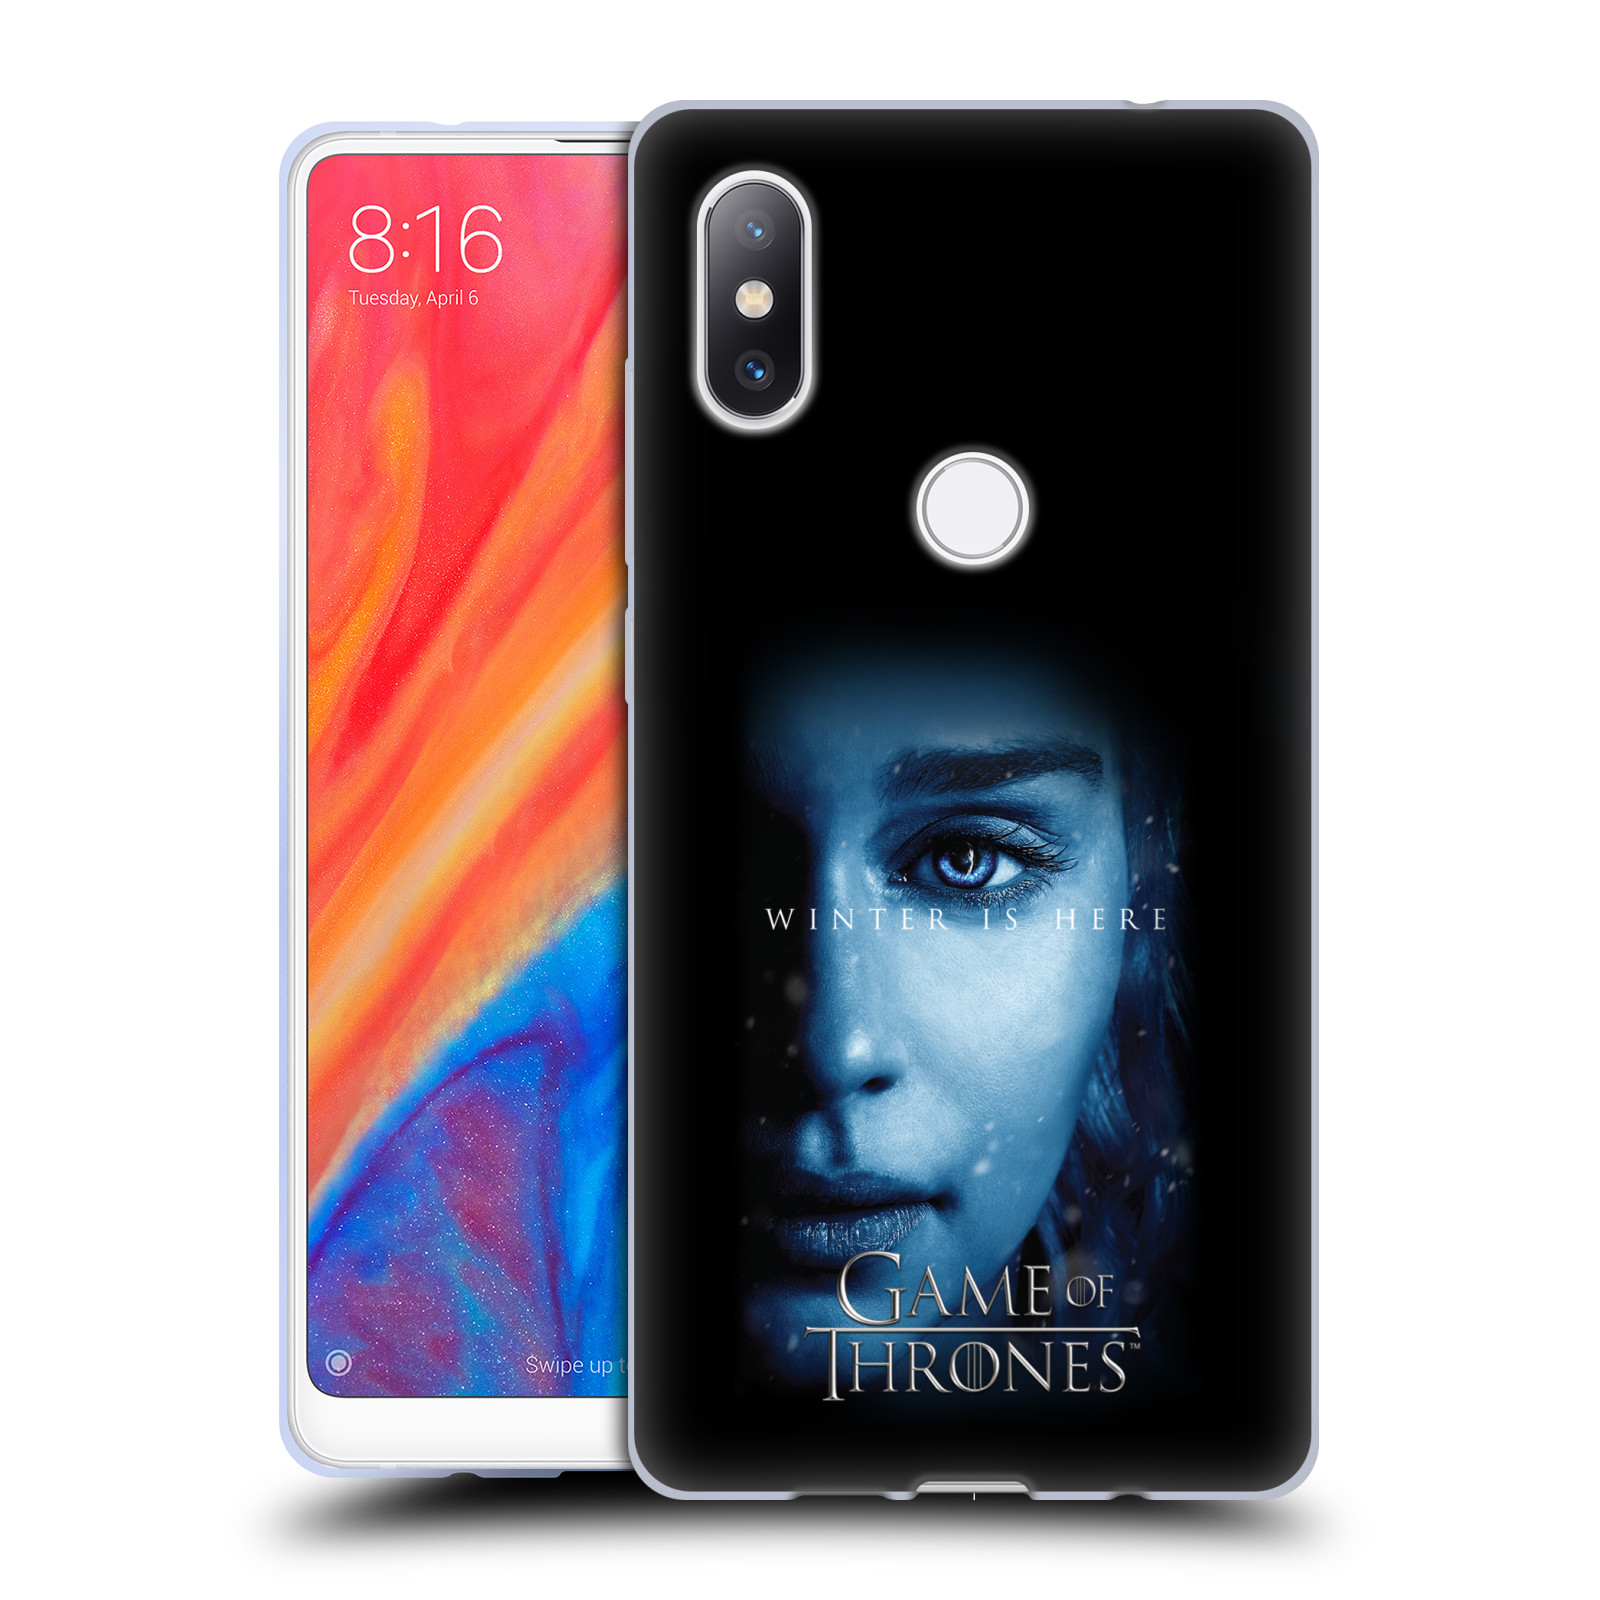 Silikonové pouzdro na mobil Xiaomi Mi Mix 2S - Head Case - Hra o trůny - Daenerys Targaryen - Winter is here